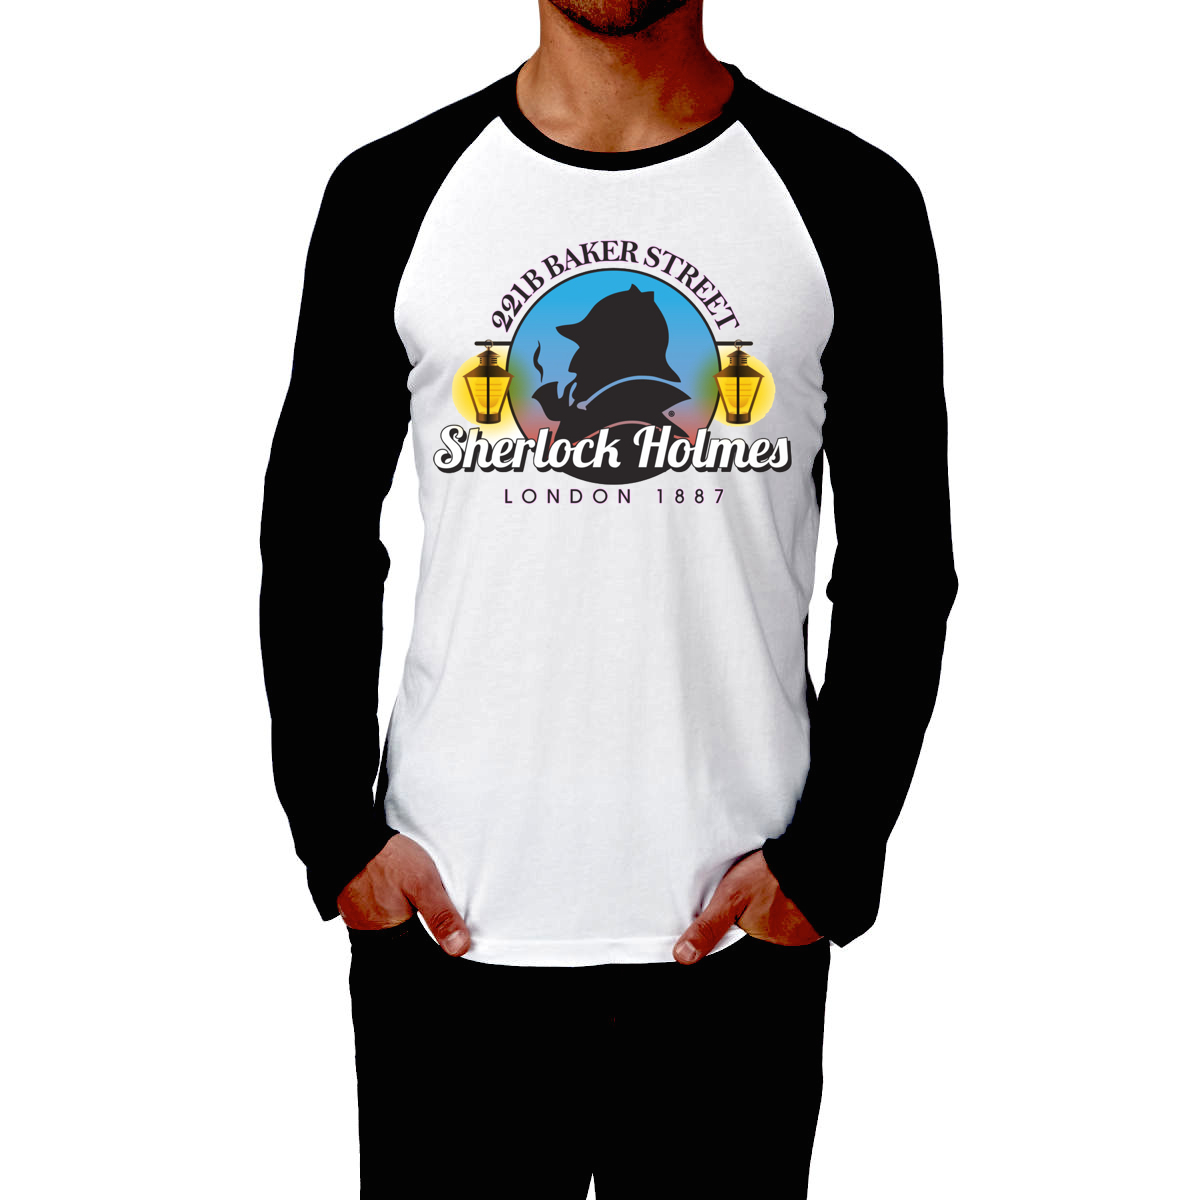 Sherlock Holmes Full Sleeve T Shirt Online Part 1